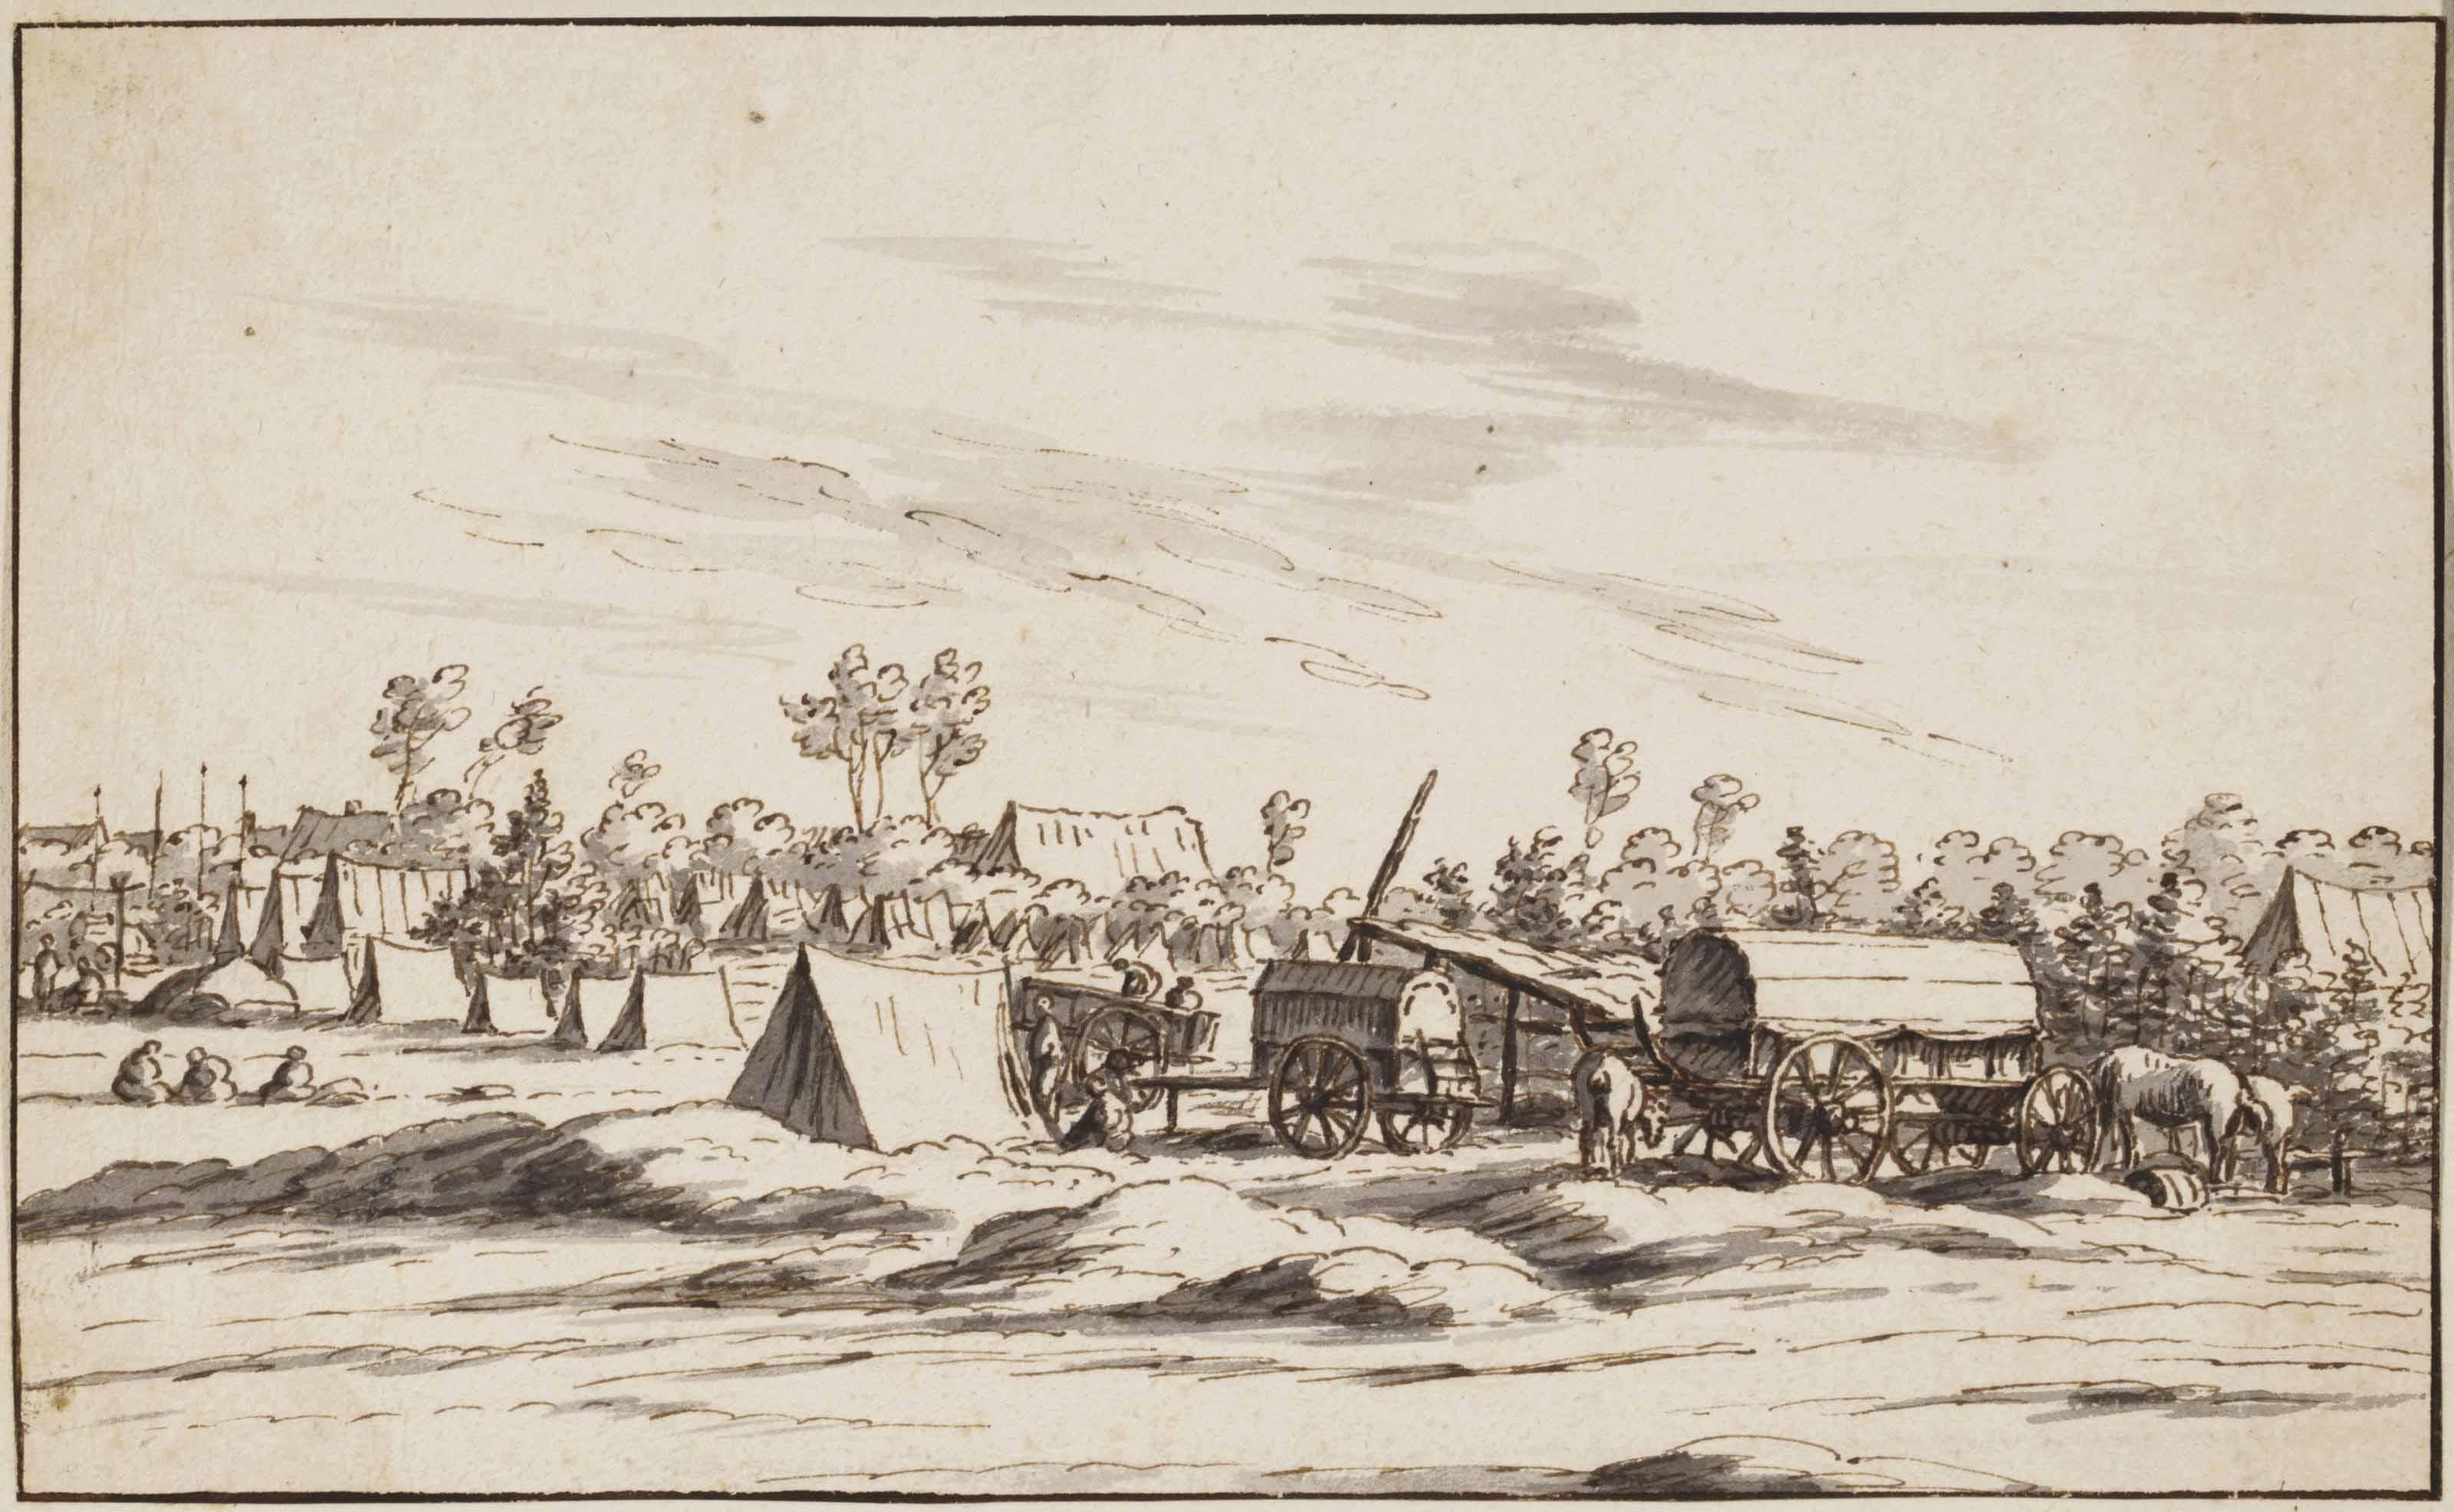 A military encampment